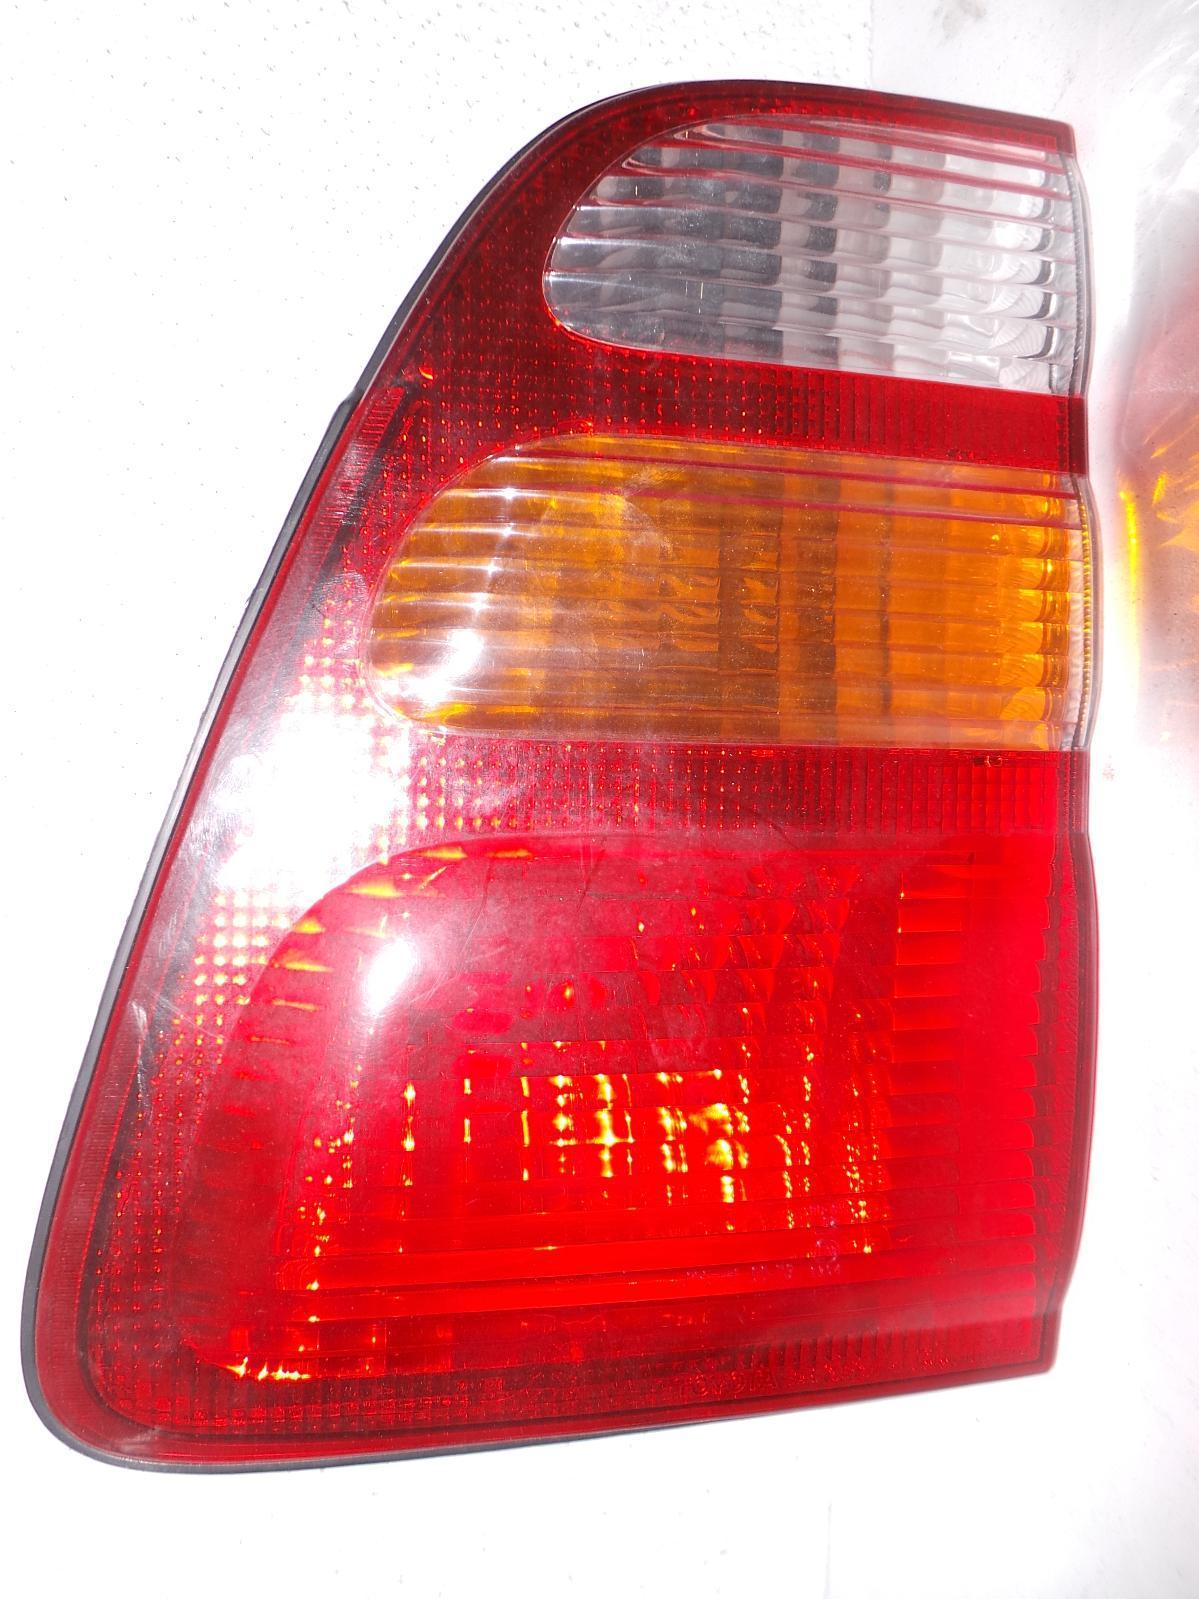 TOYOTA LANDCRUISER, Rear Garnish, 100 SERIES, TAILGATE LAMP (RH SIDE), 01/98-08/02